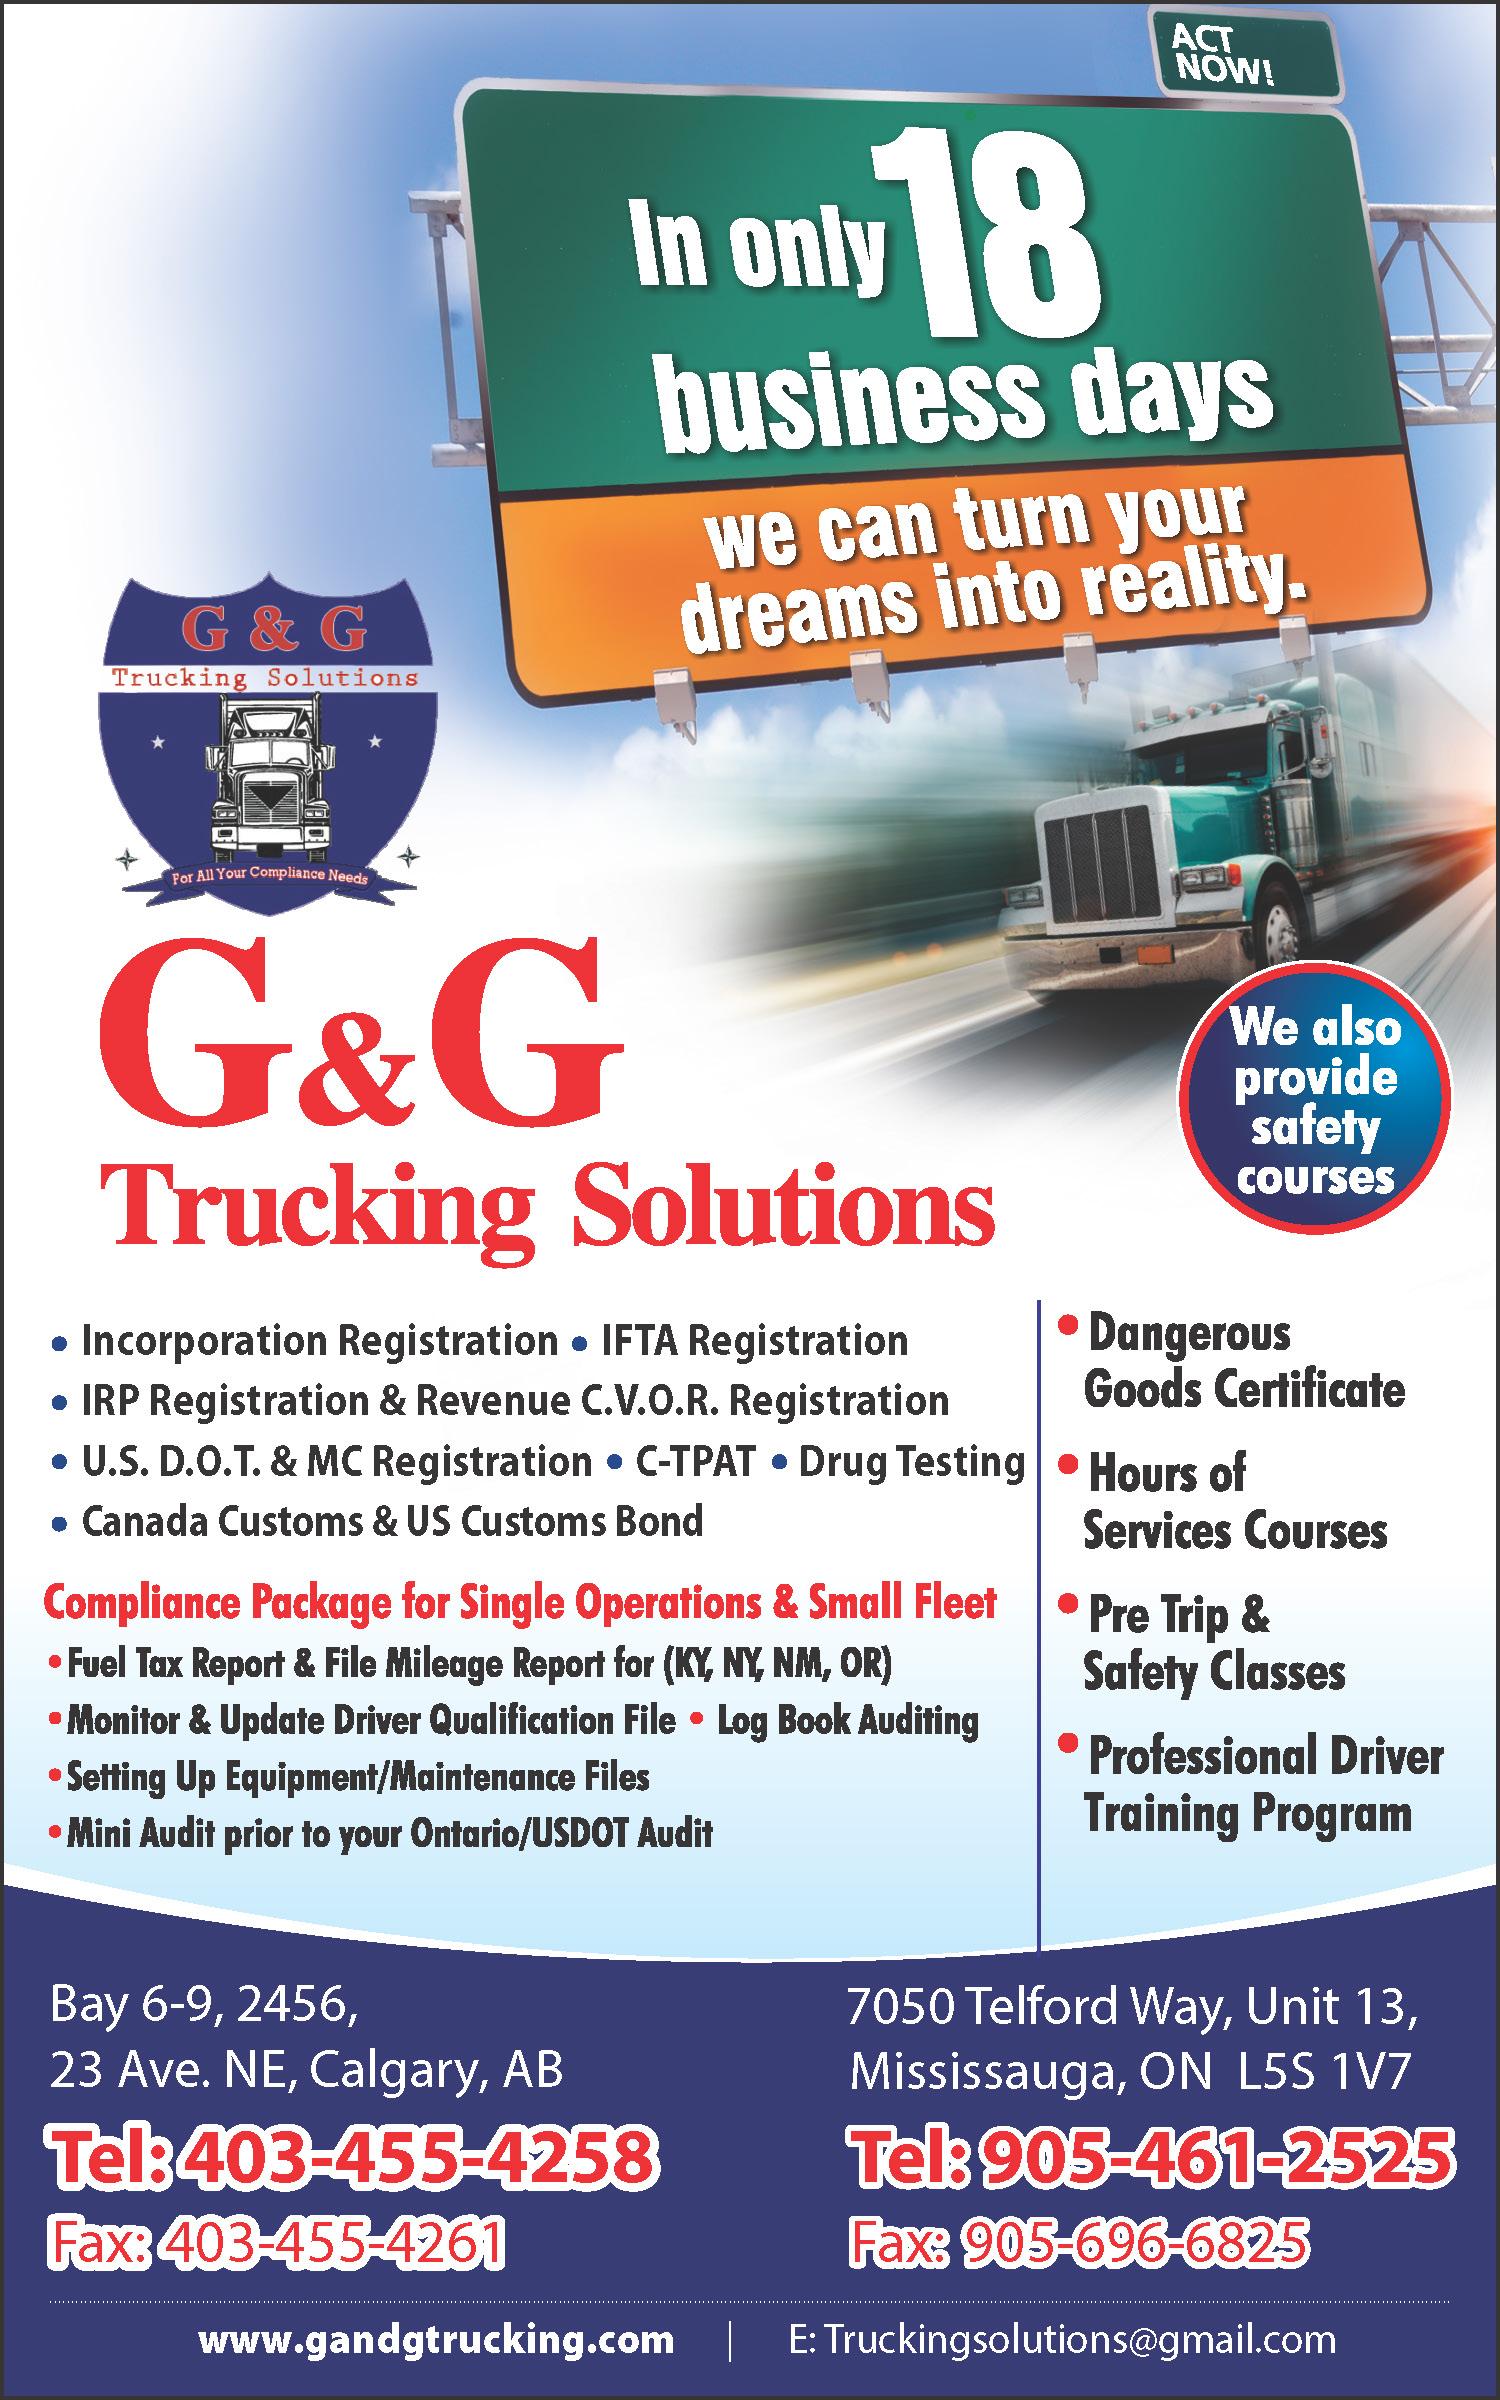 gg-trucking-solutions-P2Ol98X.jpeg